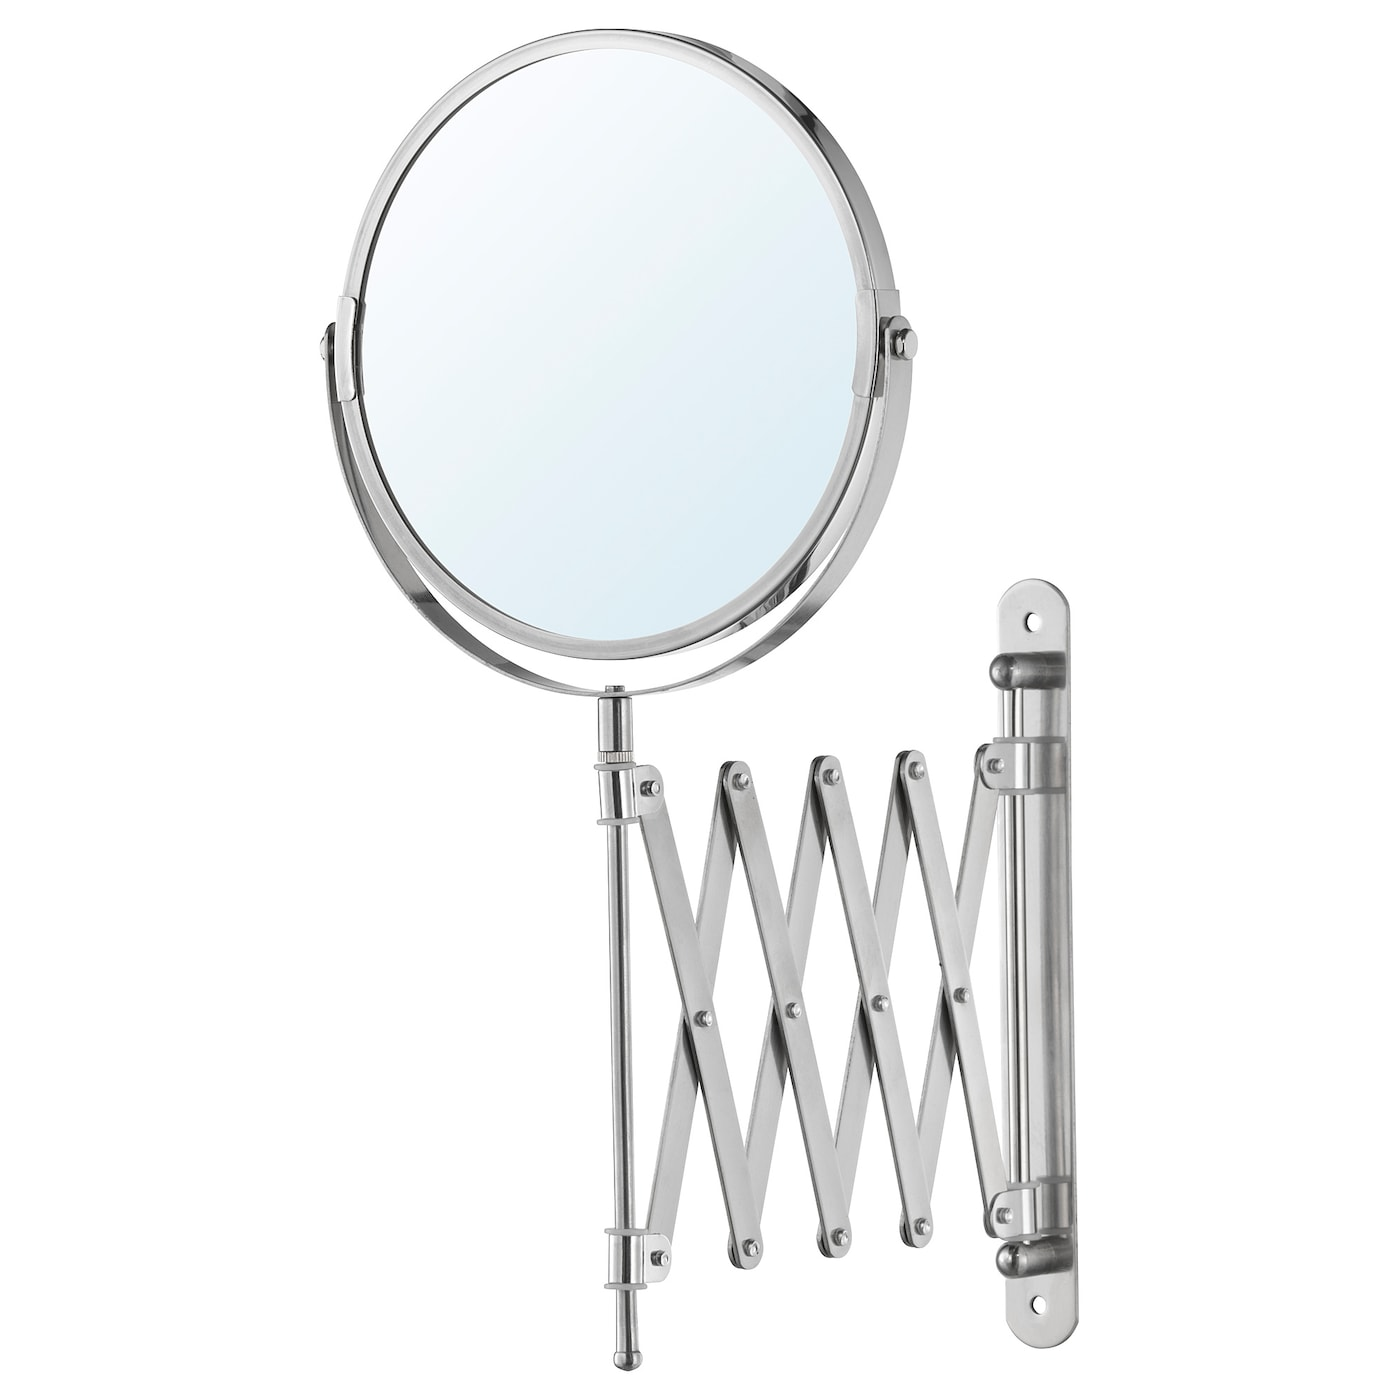 Ikea Mirror Extendable Magnifying Frack Makeup Shaving Wall Mount Bathroom Supplies Accessories Bathroom Mirror